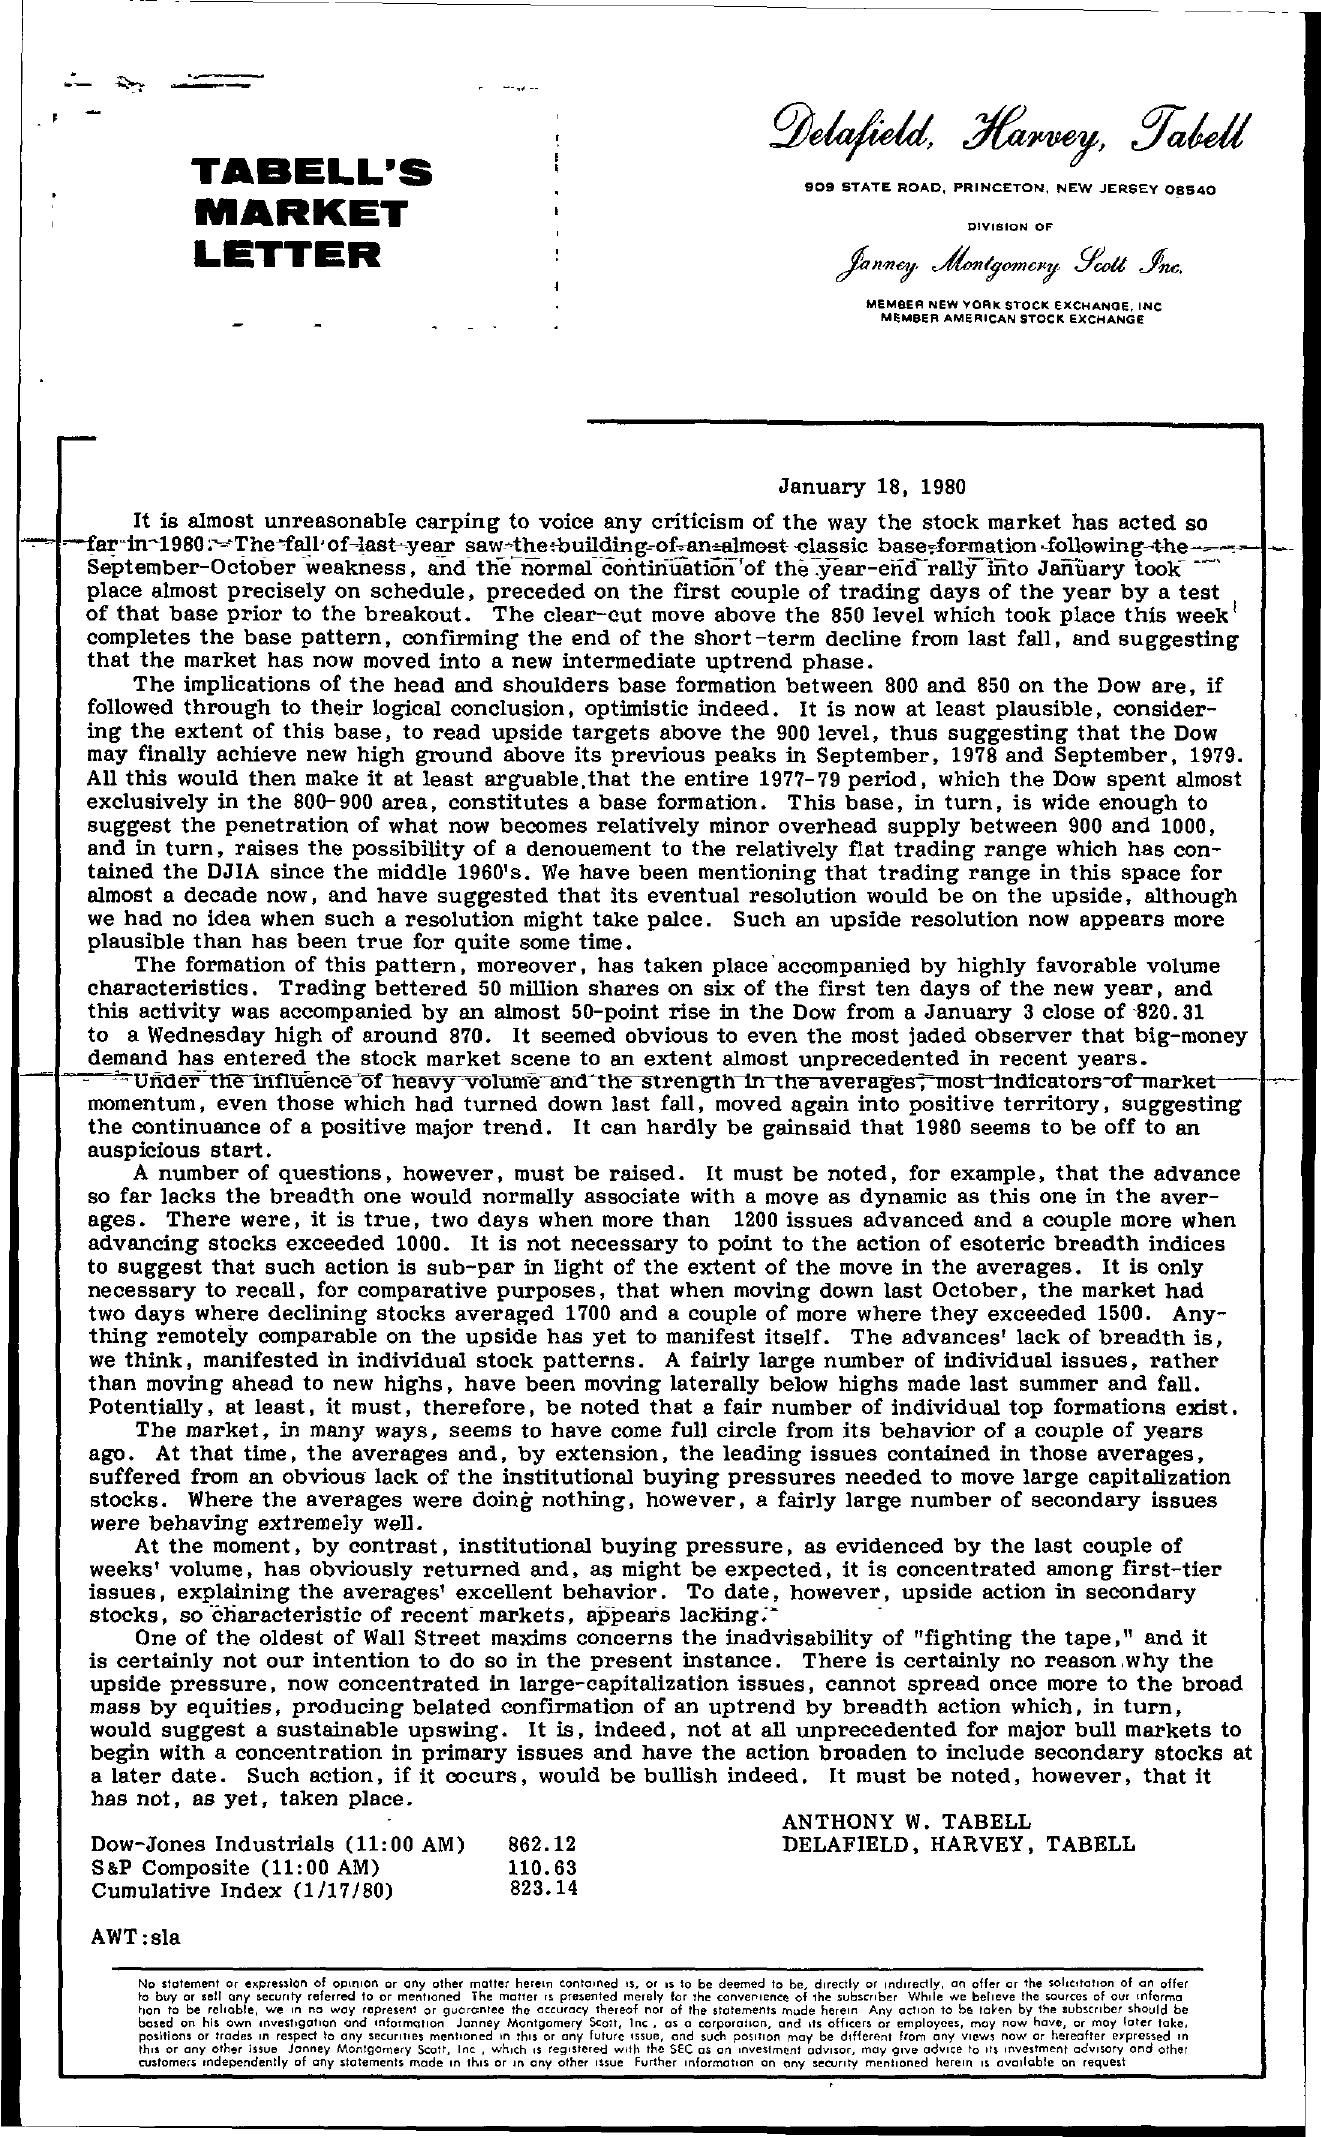 Tabell's Market Letter - January 18, 1980